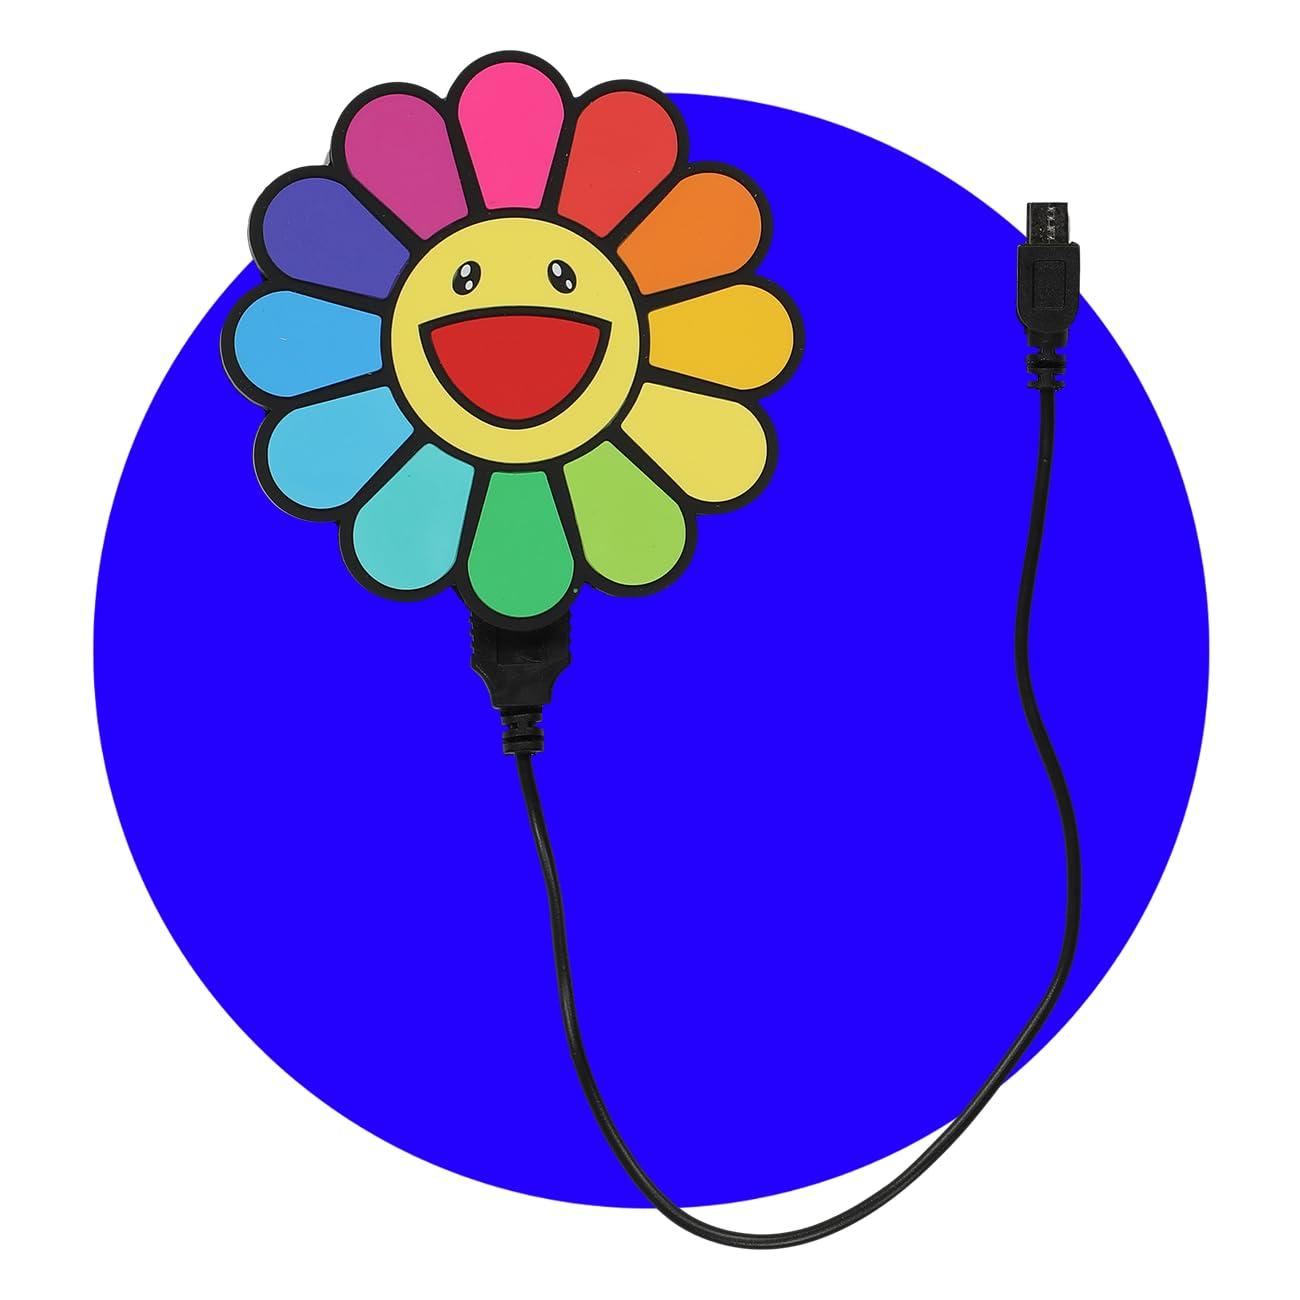 ComplexCon Takashi Murakami Flower Powerbank